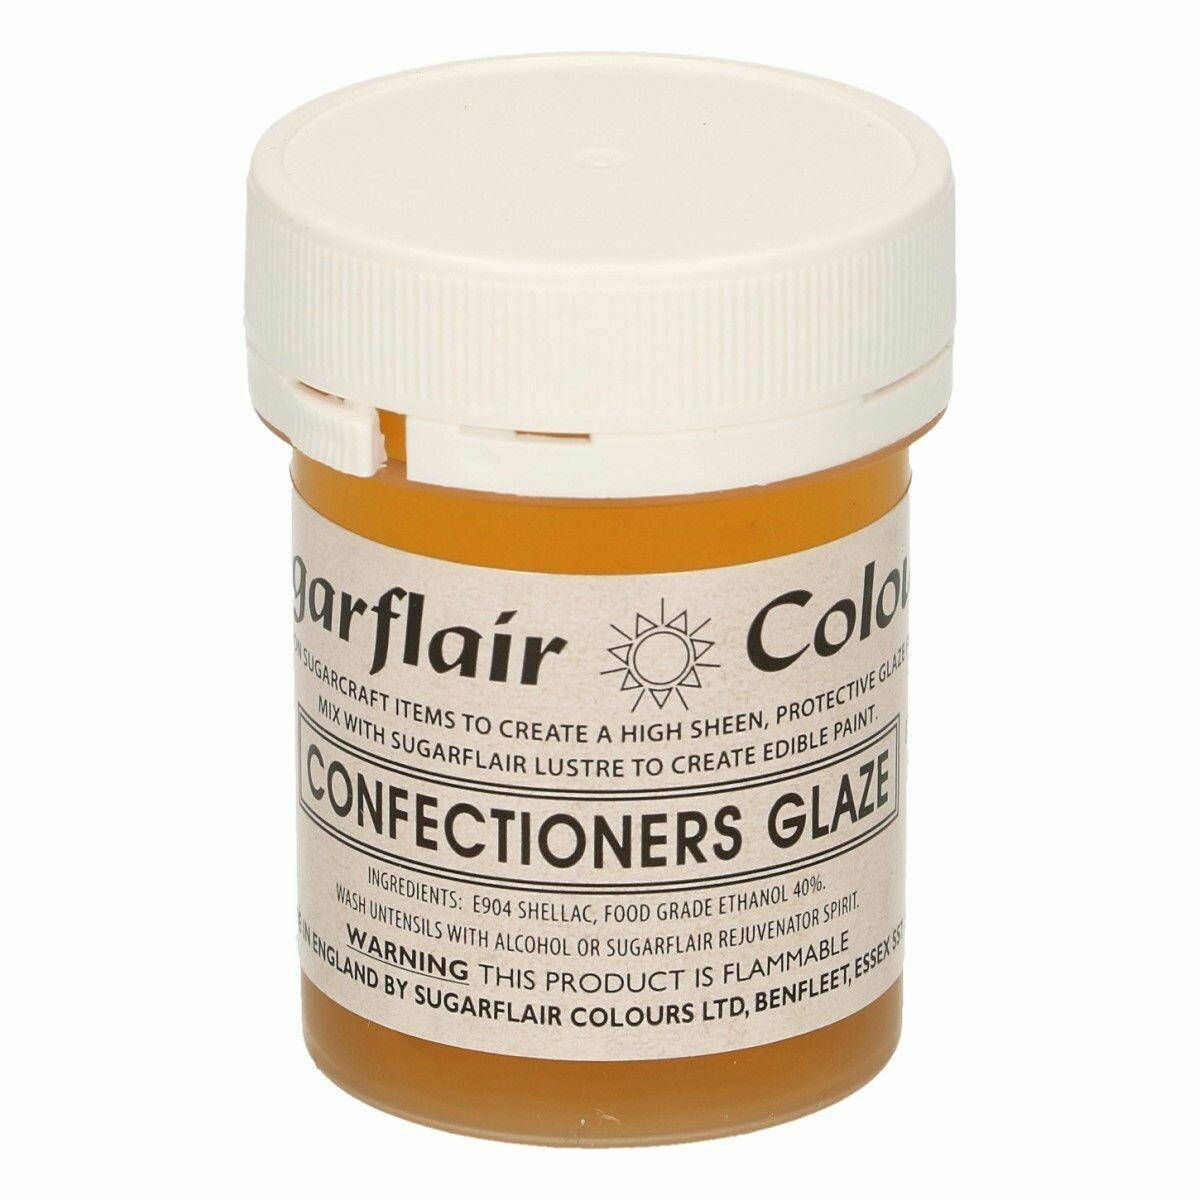 Sugarflair Confectioners Glaze 50ml -Γυαλιστικό ζαχαροπλαστικής